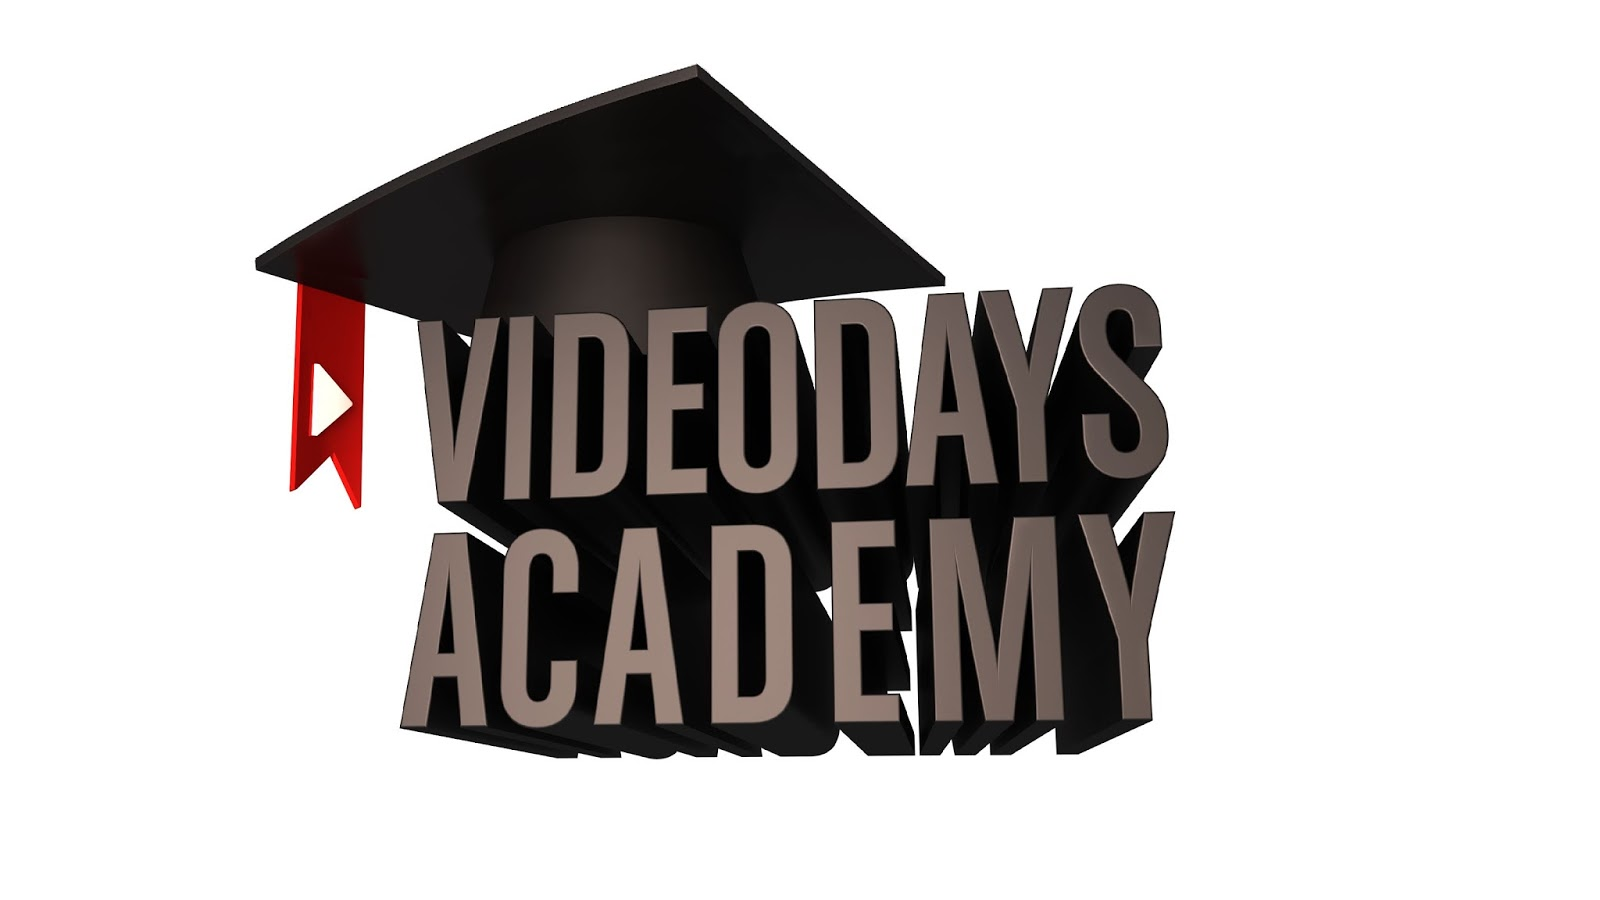 Videodays Academy logo.jpg